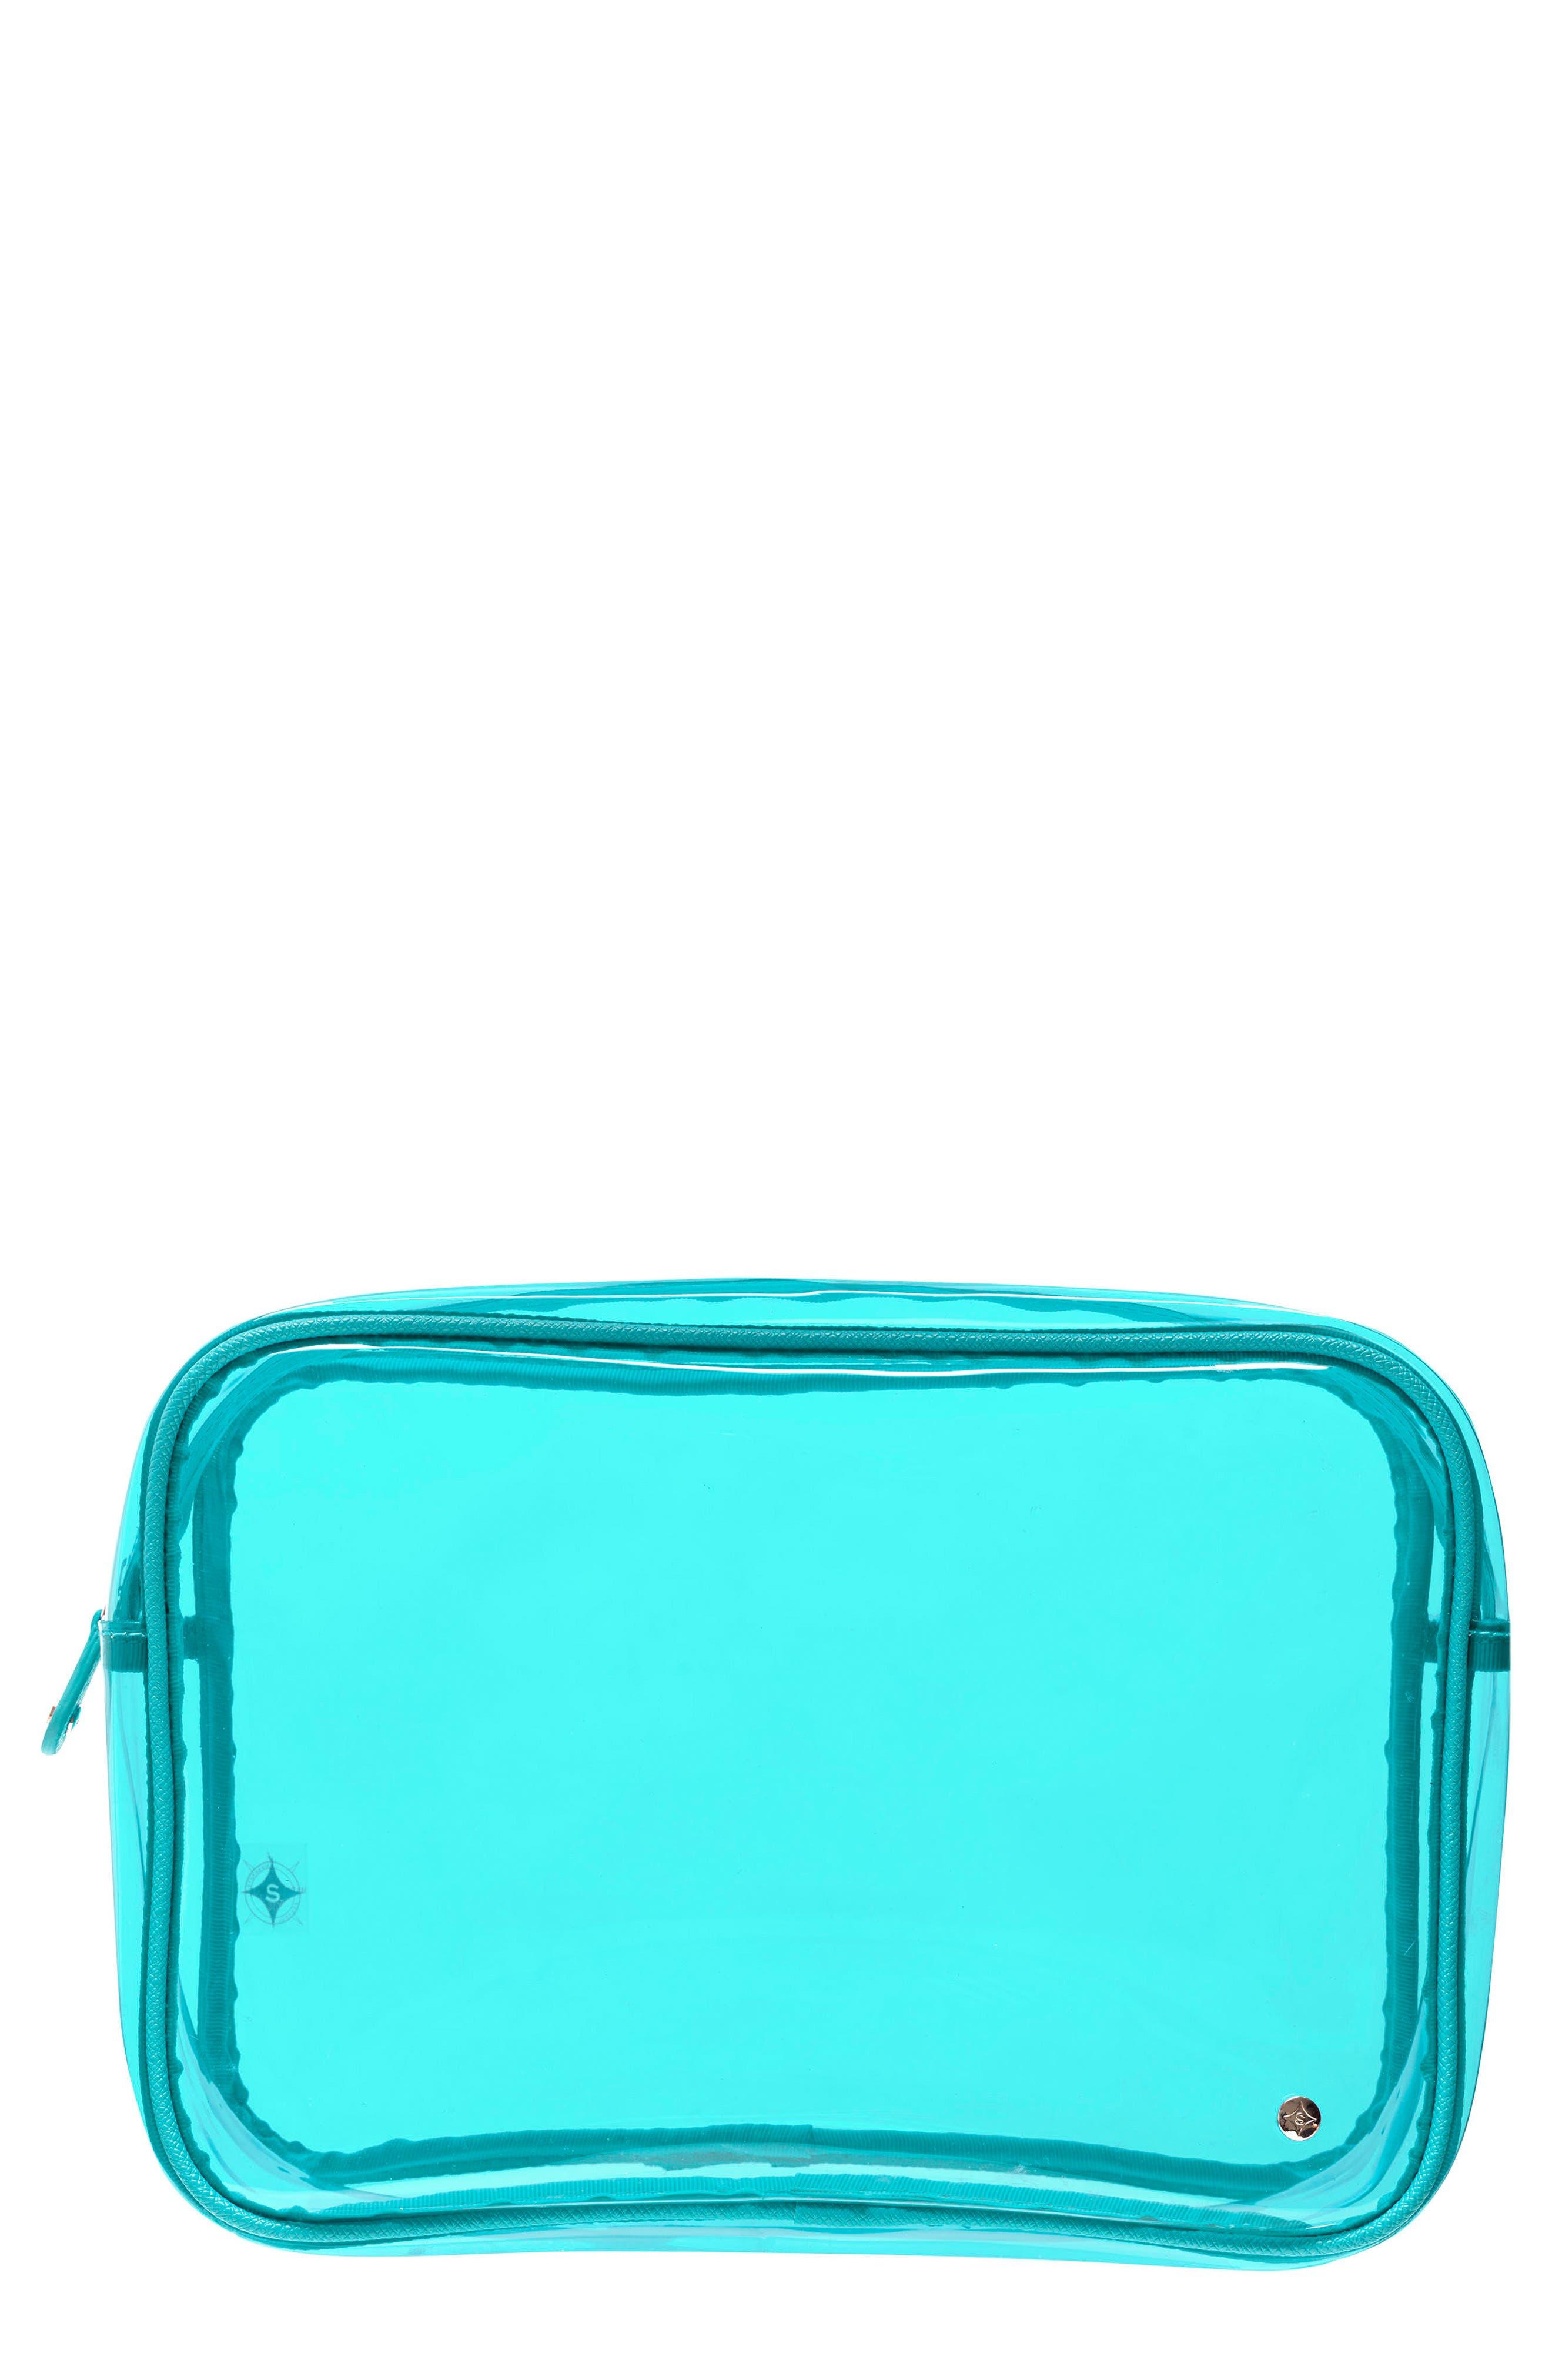 Miami Jumbo Zip Cosmetics Case,                         Main,                         color, Miami Blue